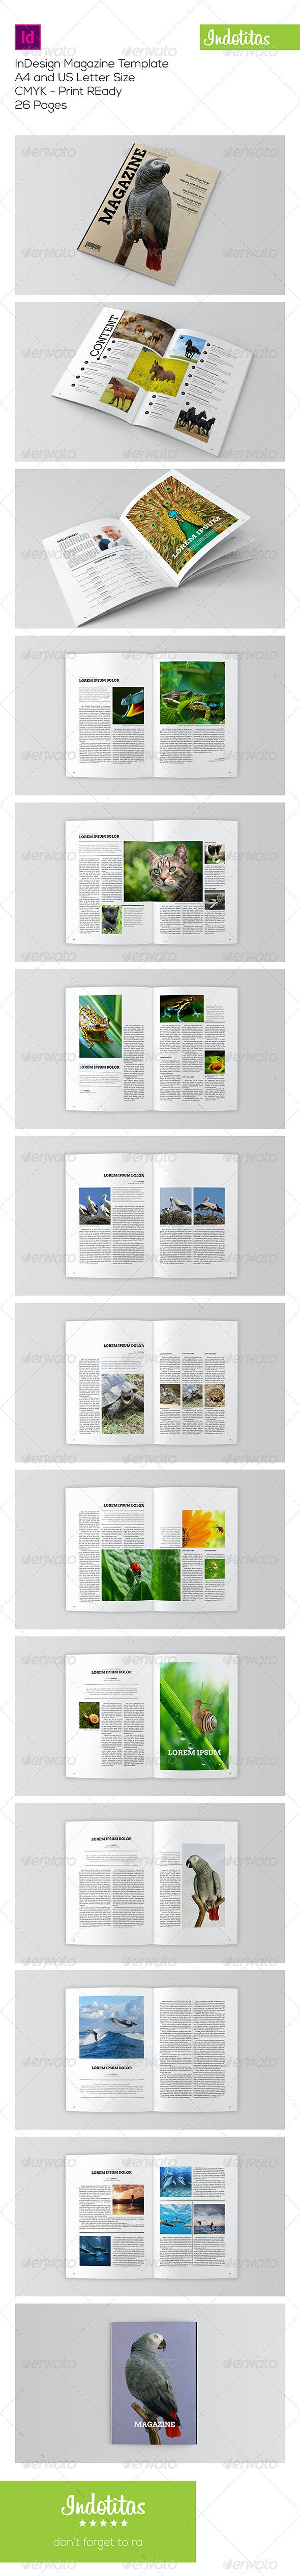 Animal Magazine Template - Magazines Print Templates